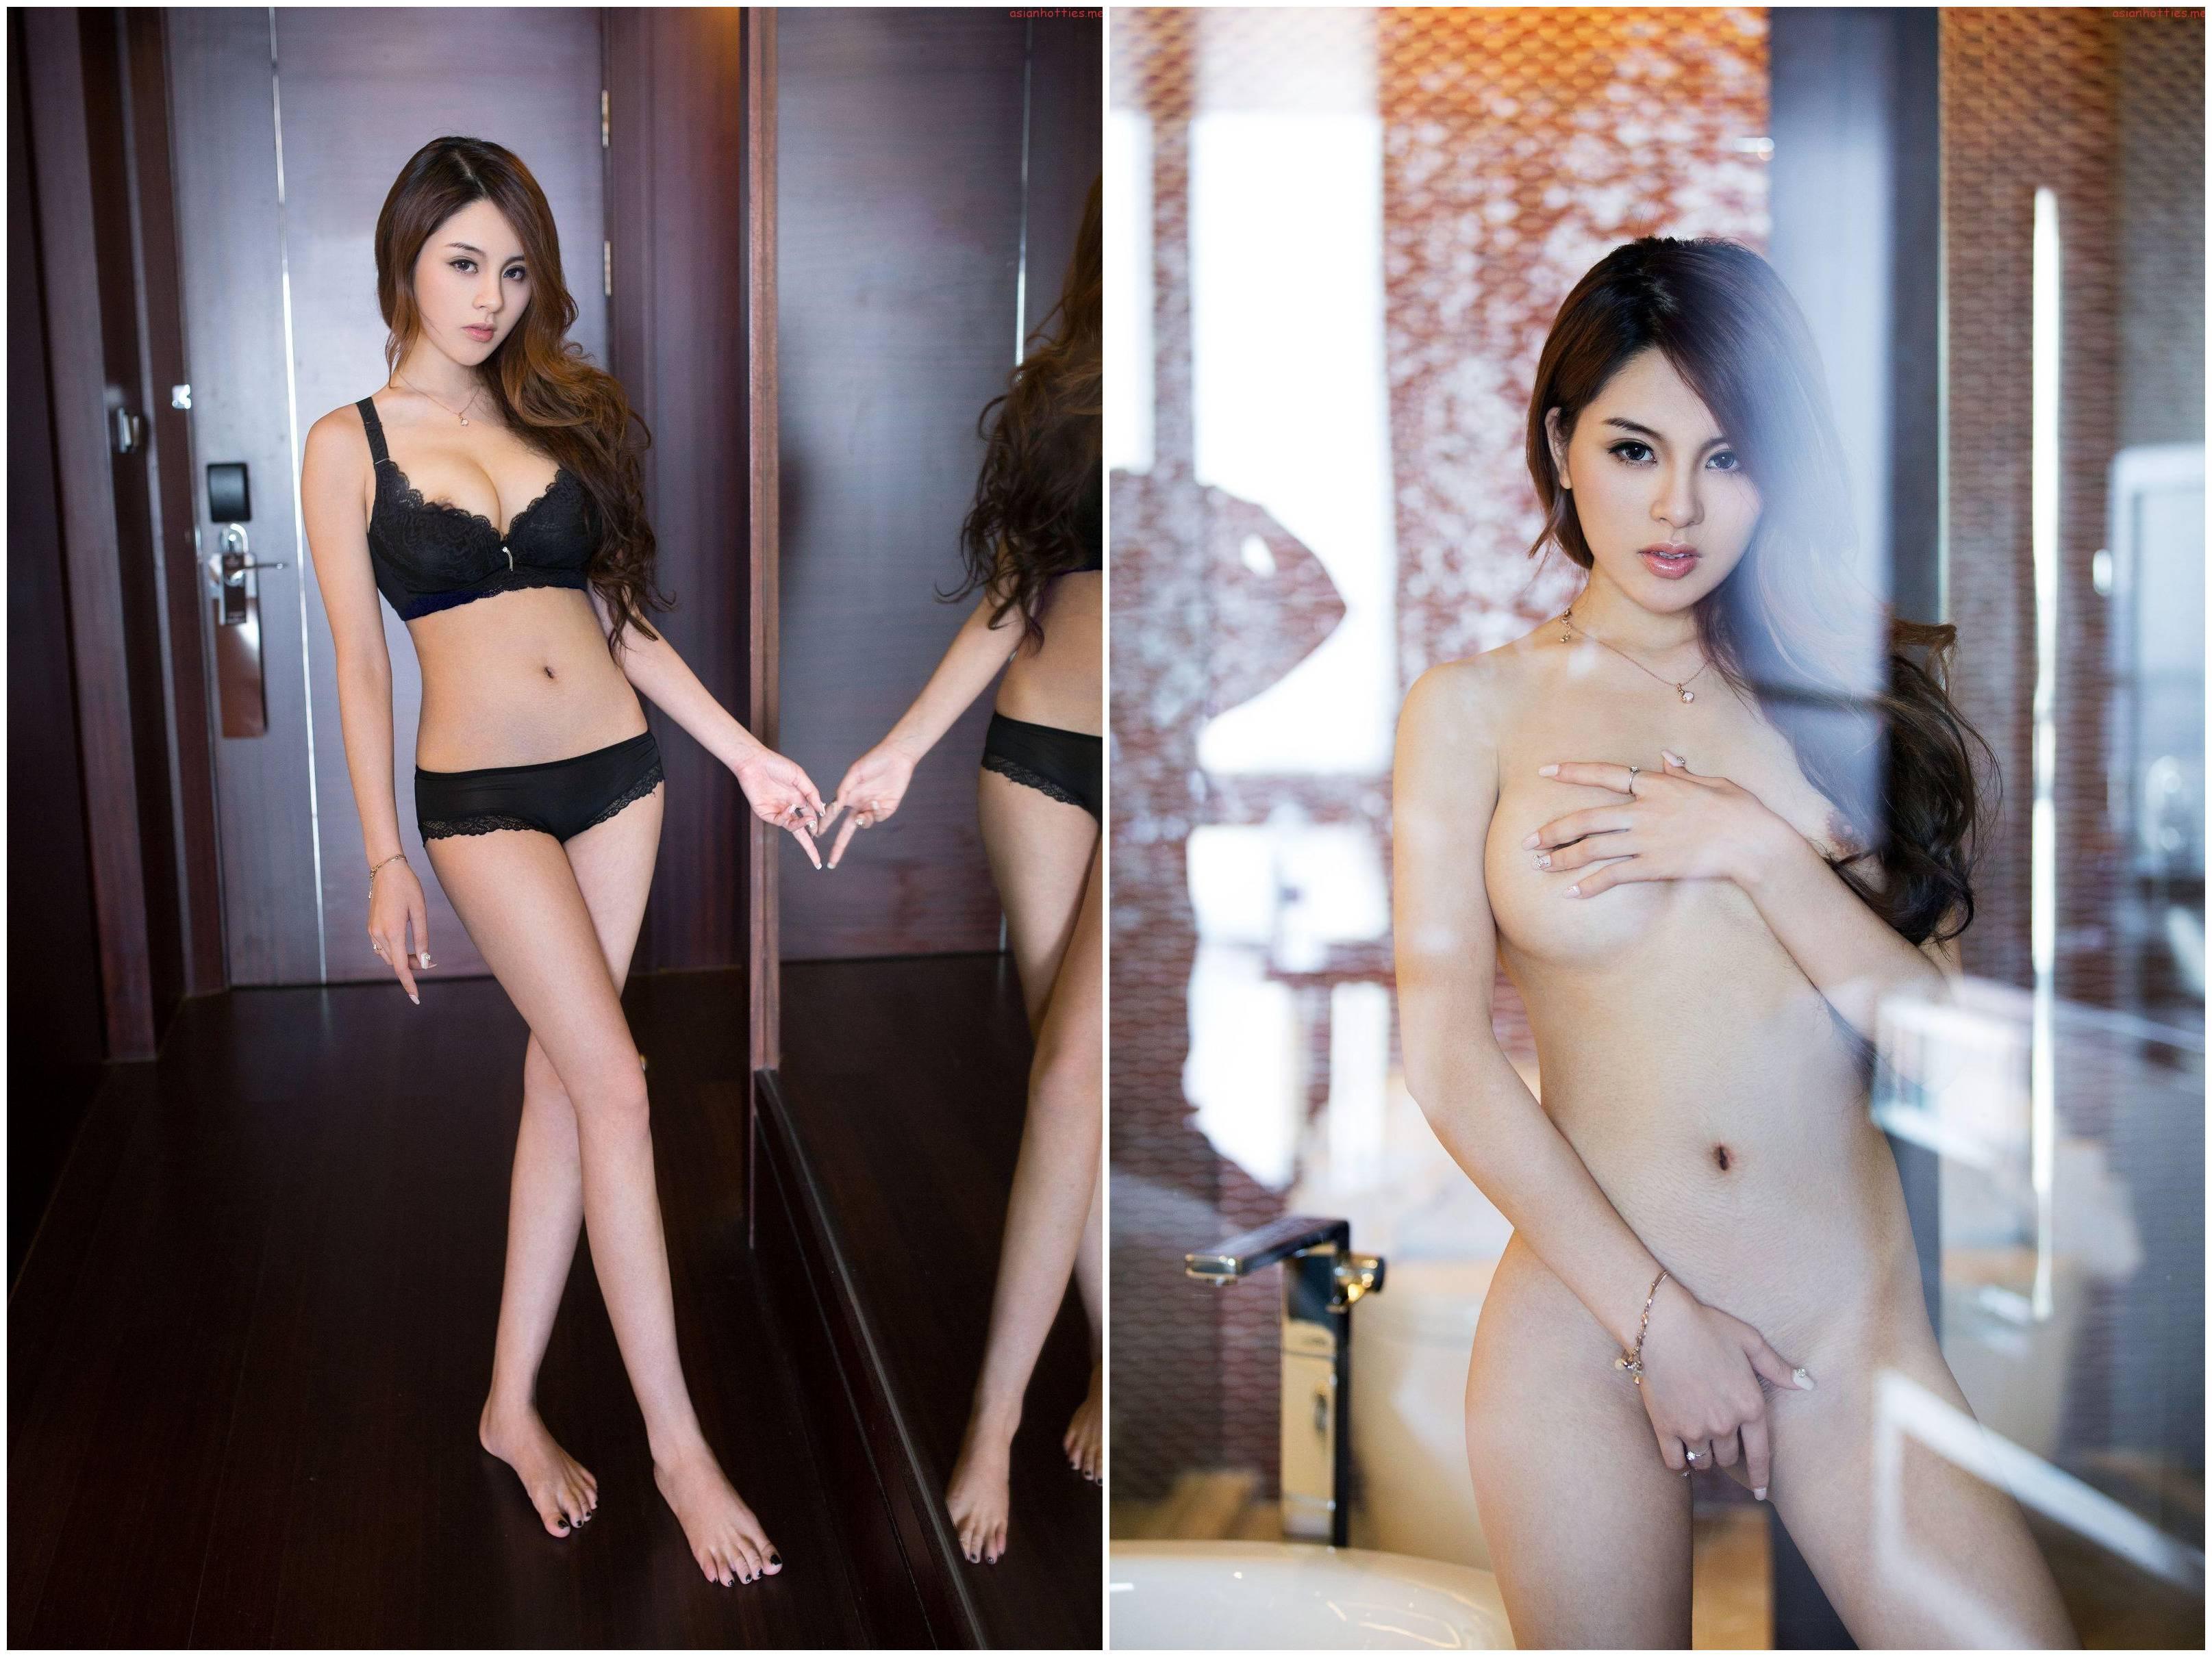 Vicki zhao nude pics on nude